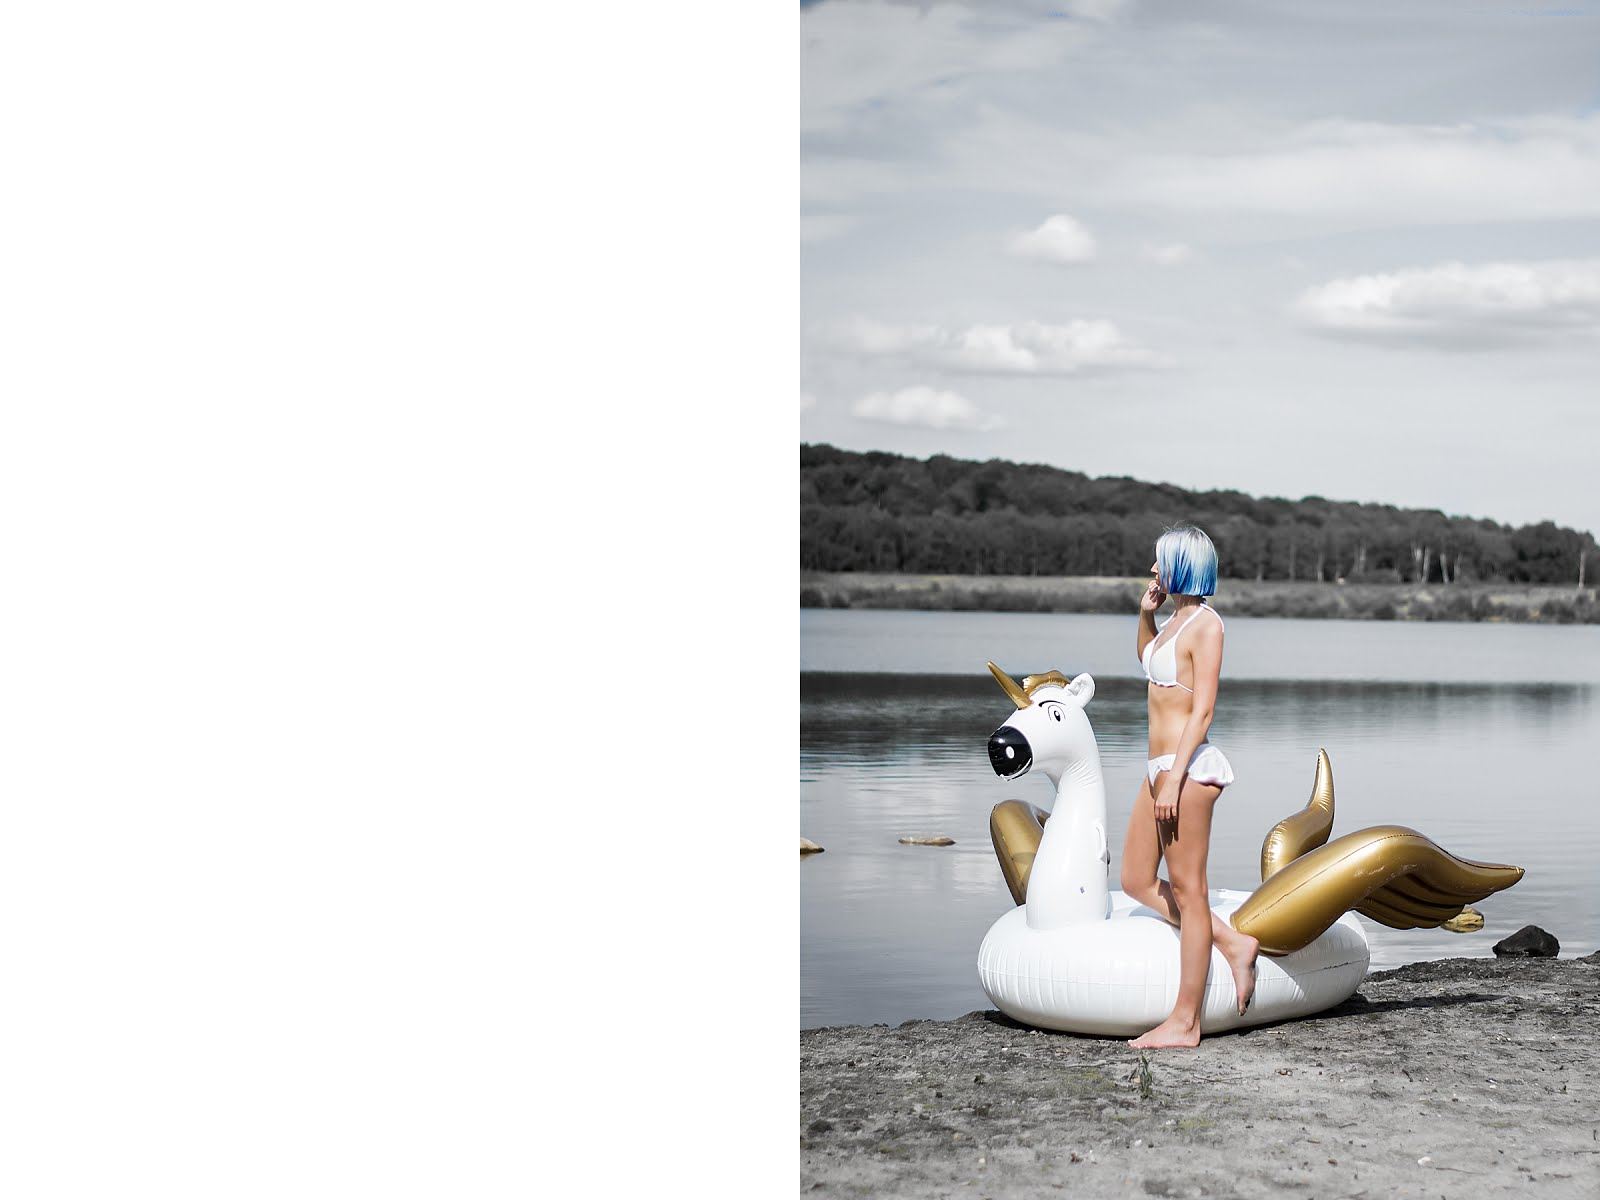 Coolgift, pegasus, opblaasbare, zwembad, pool float, unicorn, donut, melon, pizza, flamingo, gadgets